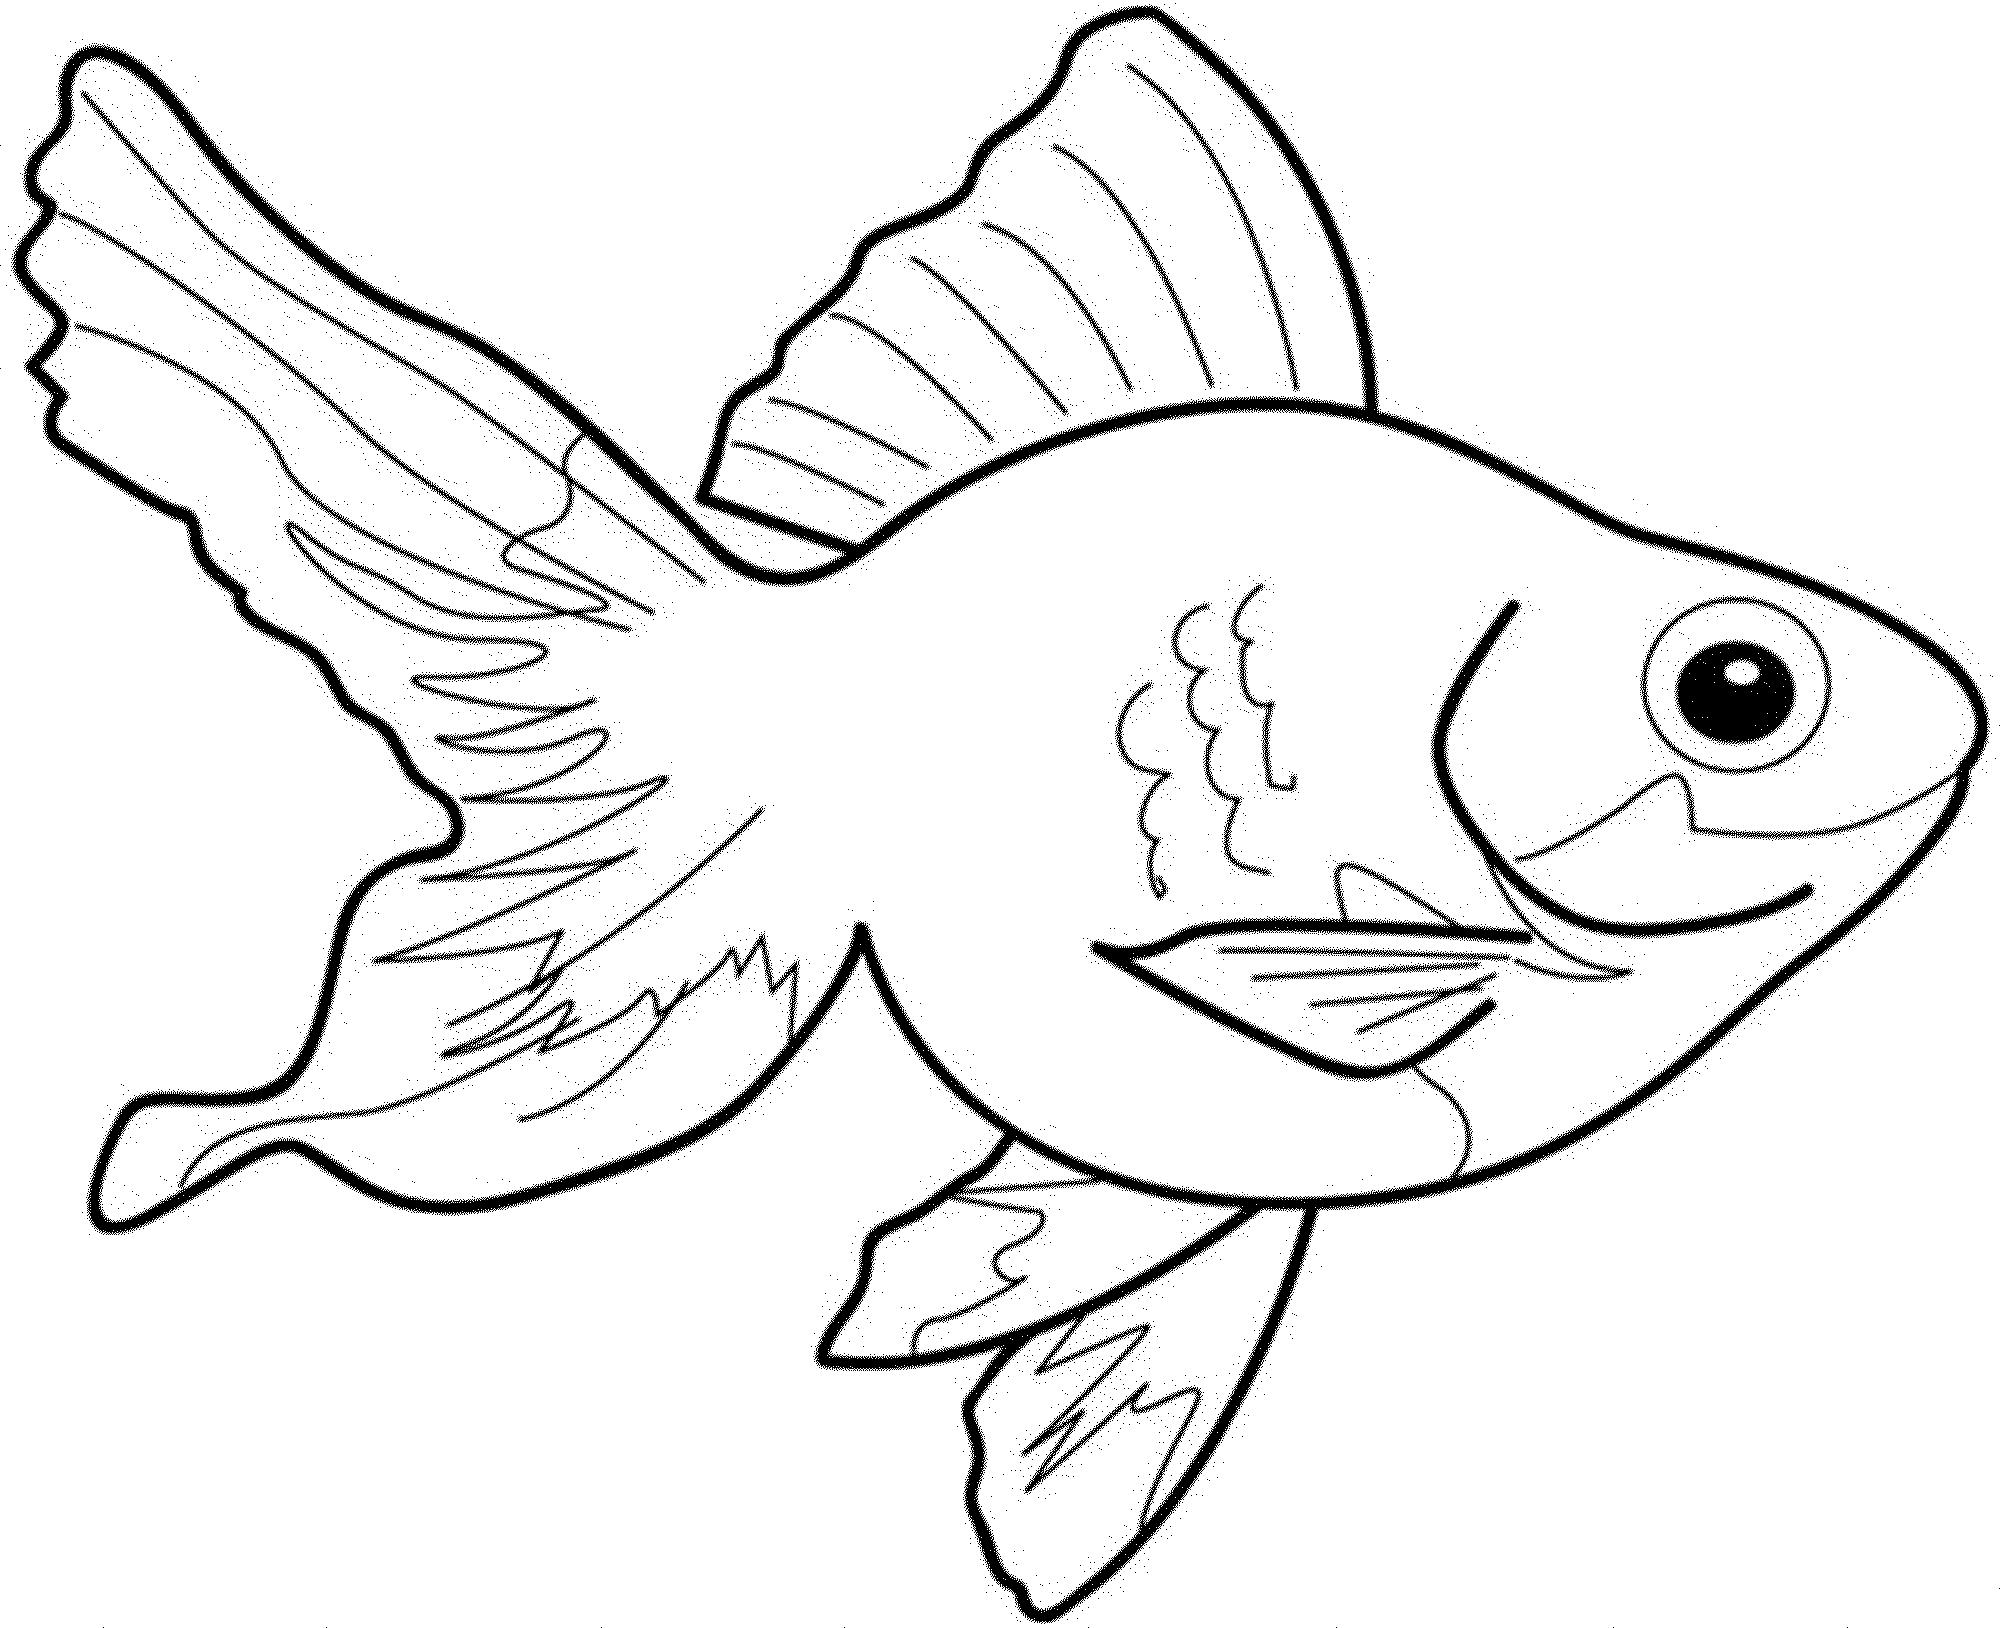 fish colouring images free fish bowl coloring sheet download free clip art images fish colouring